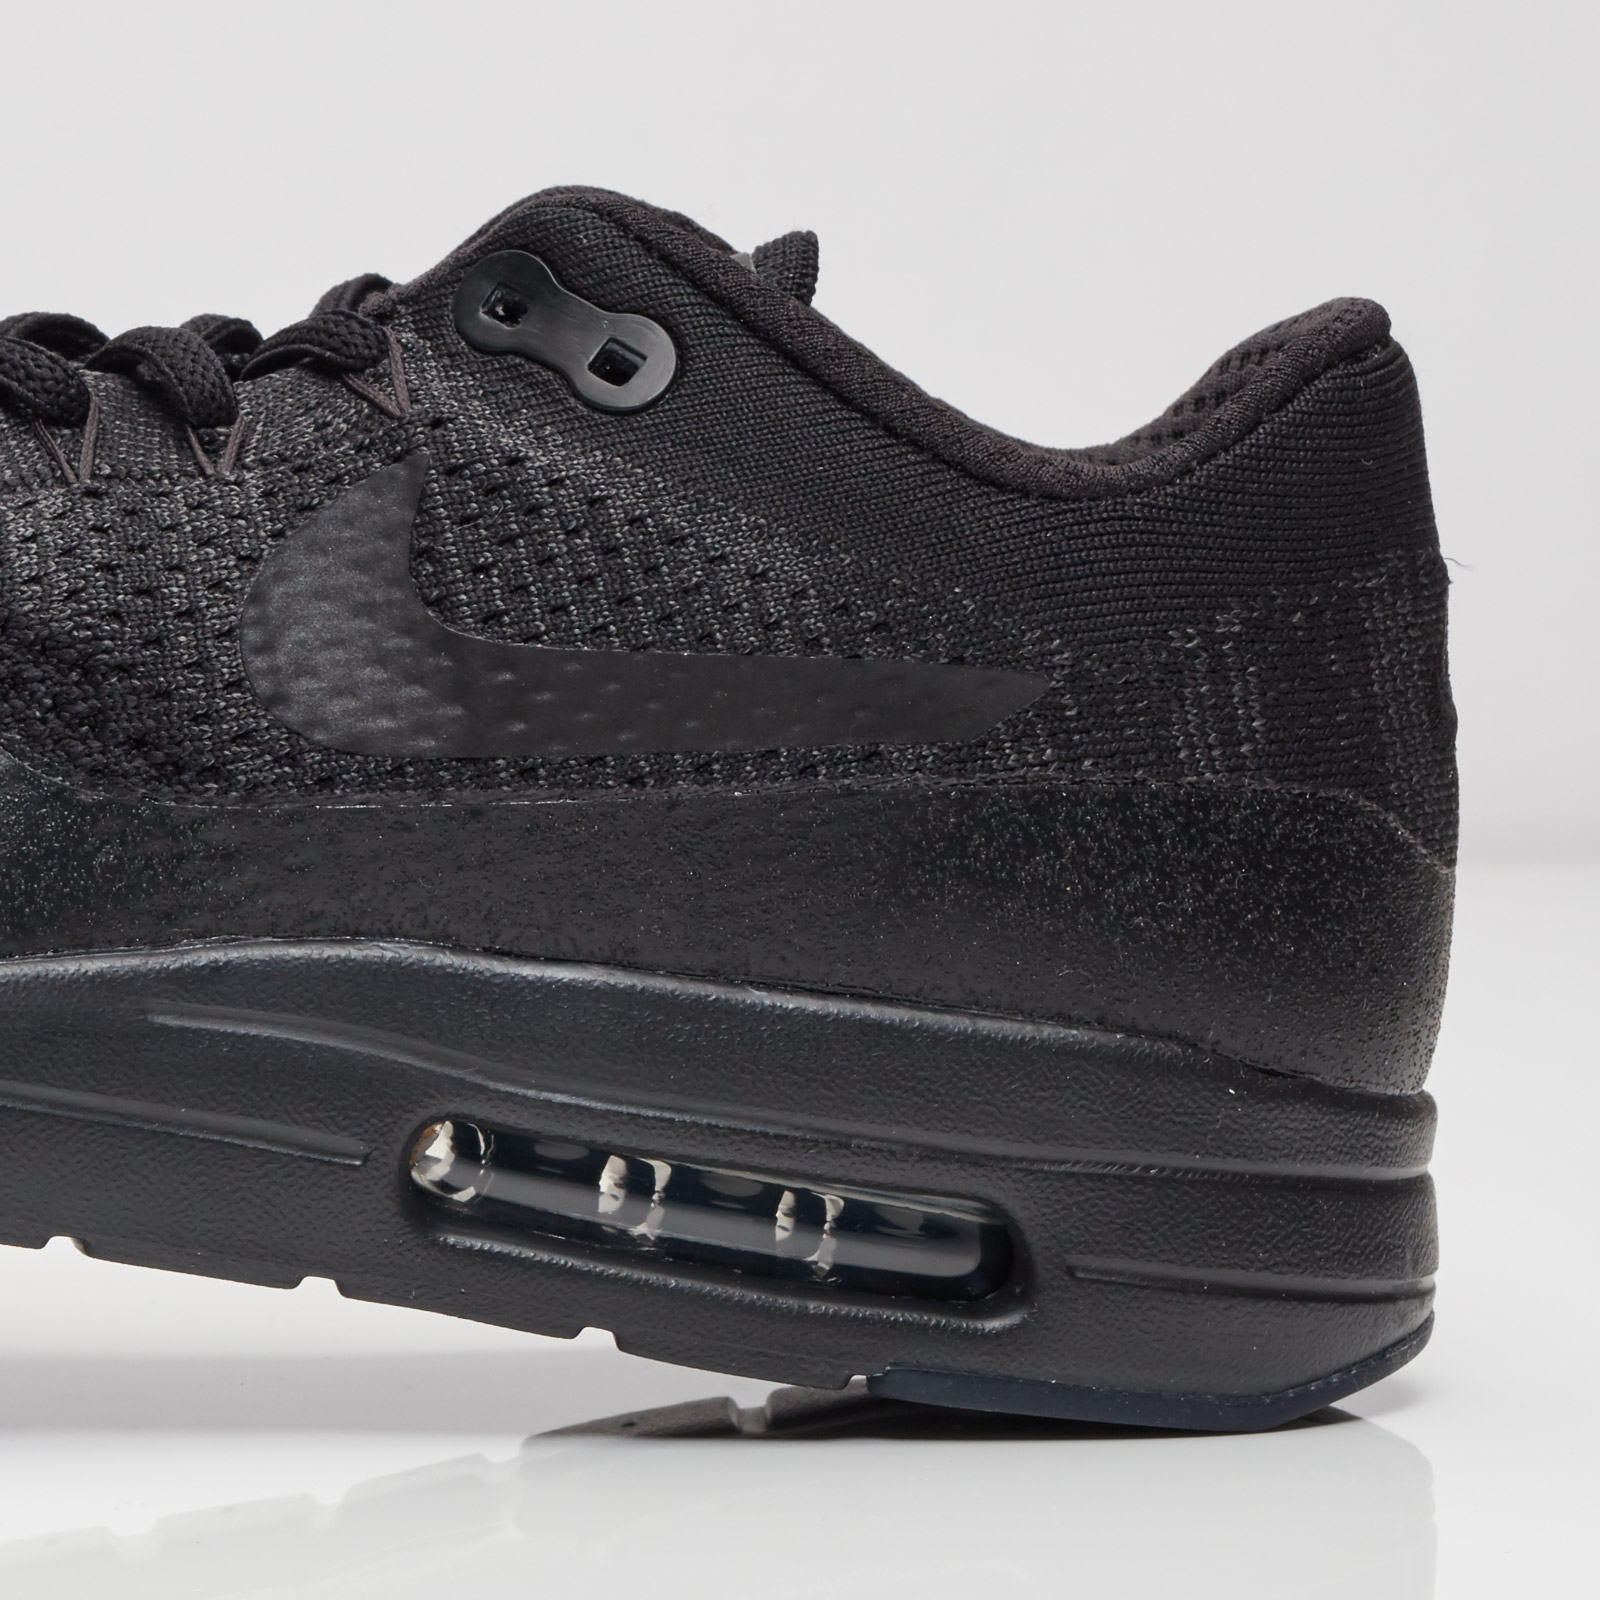 2b6bea07422 Nike Air Max 1 Ultra Flyknit - 856958-001 - Sneakersnstuff ...